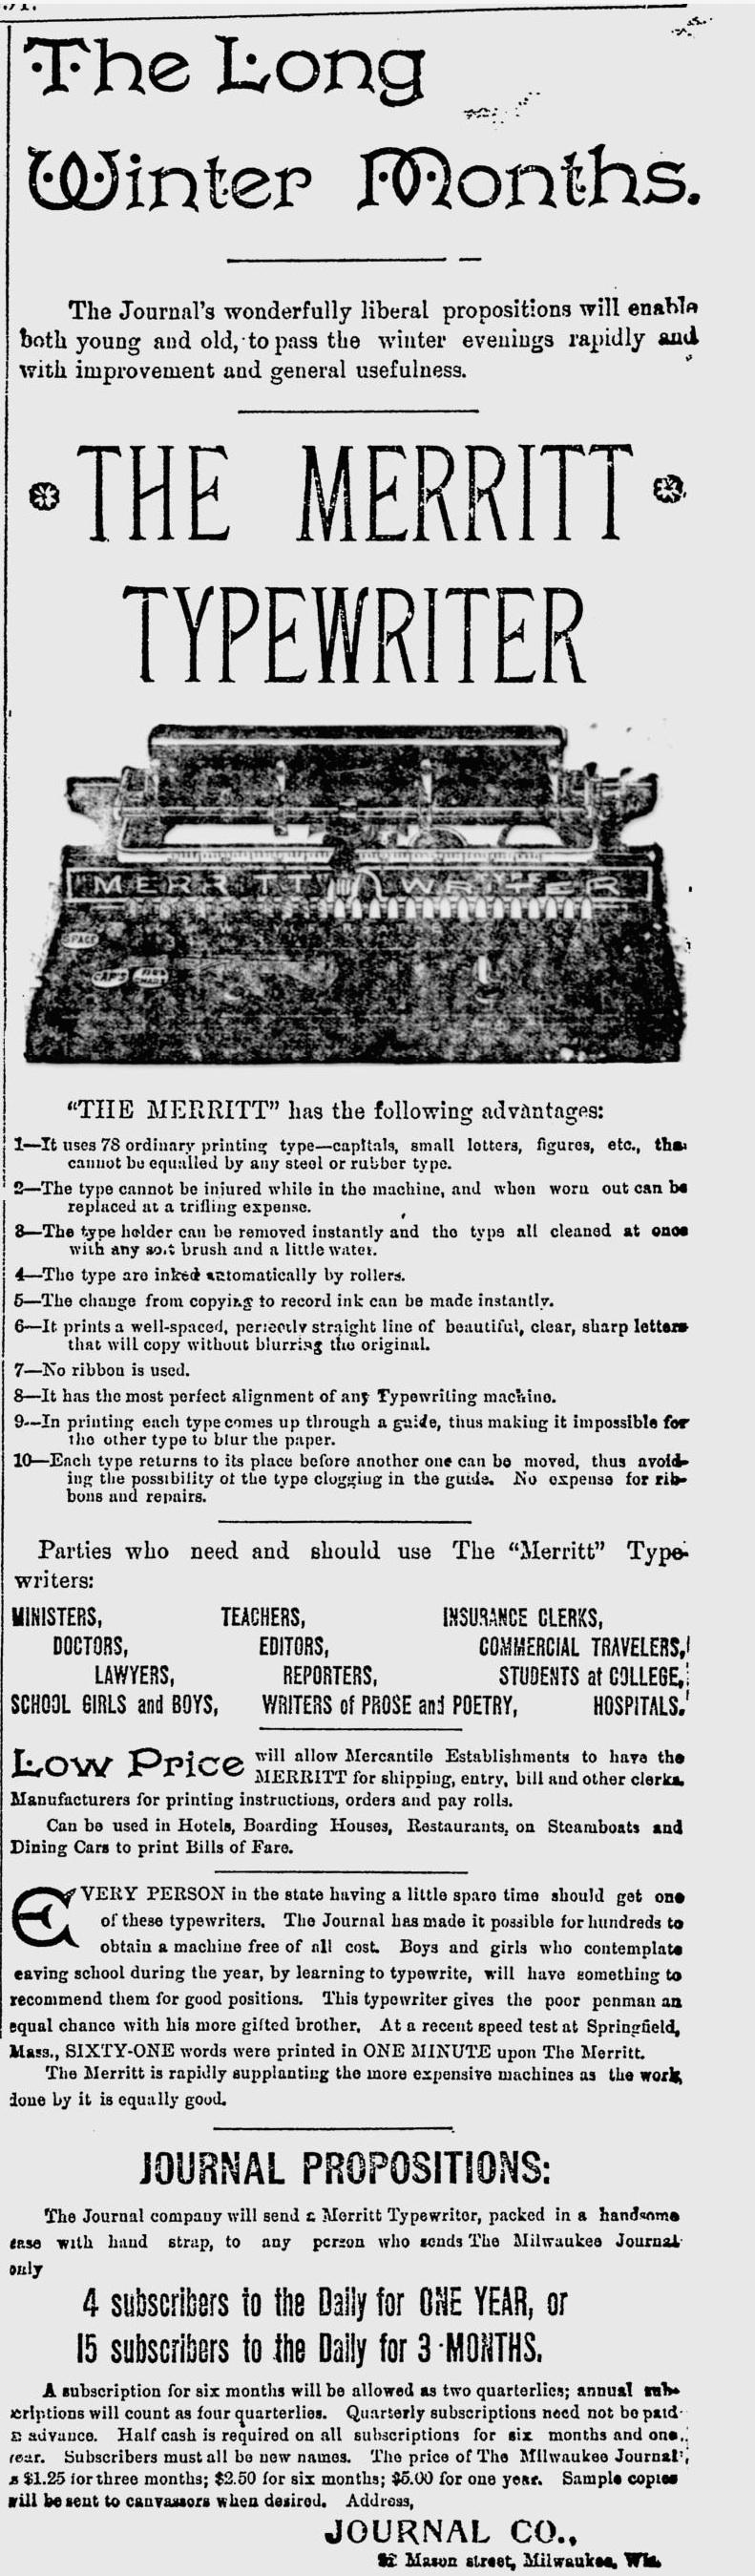 The Milwaukee Journal - Dec 23, 1891 - Merritt Typewriter Ad